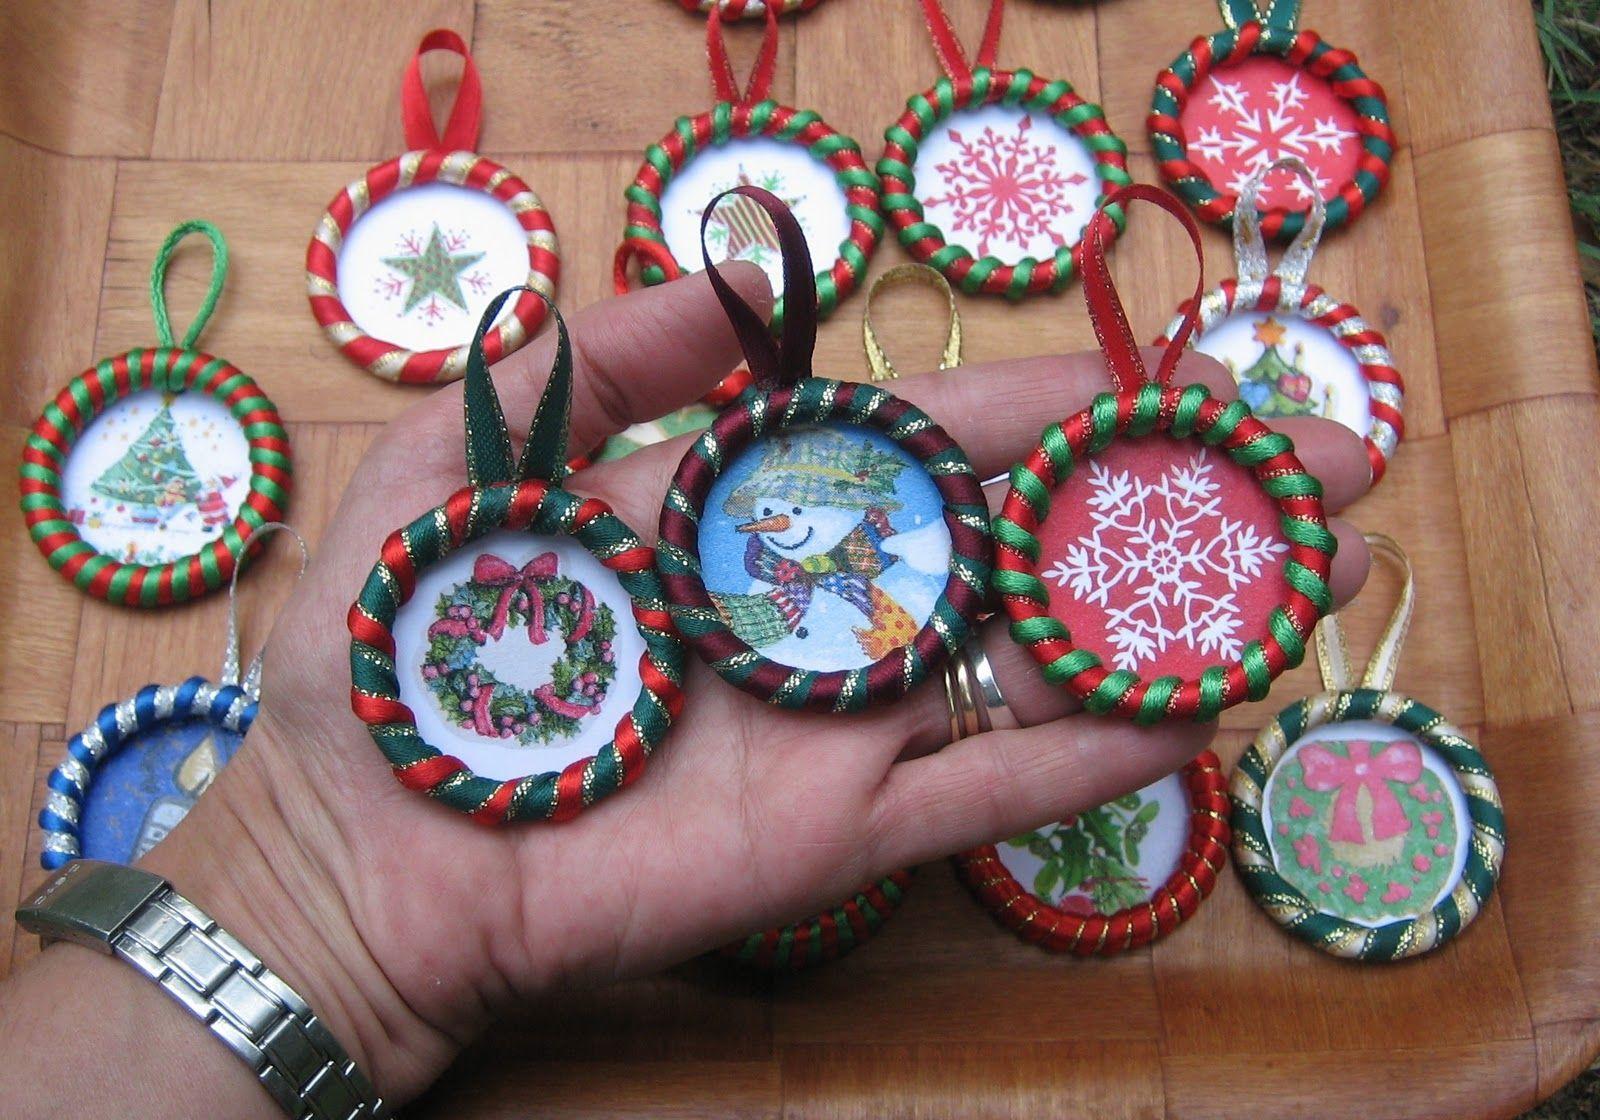 Handmade by decoupage art Decoupage gift ideas for